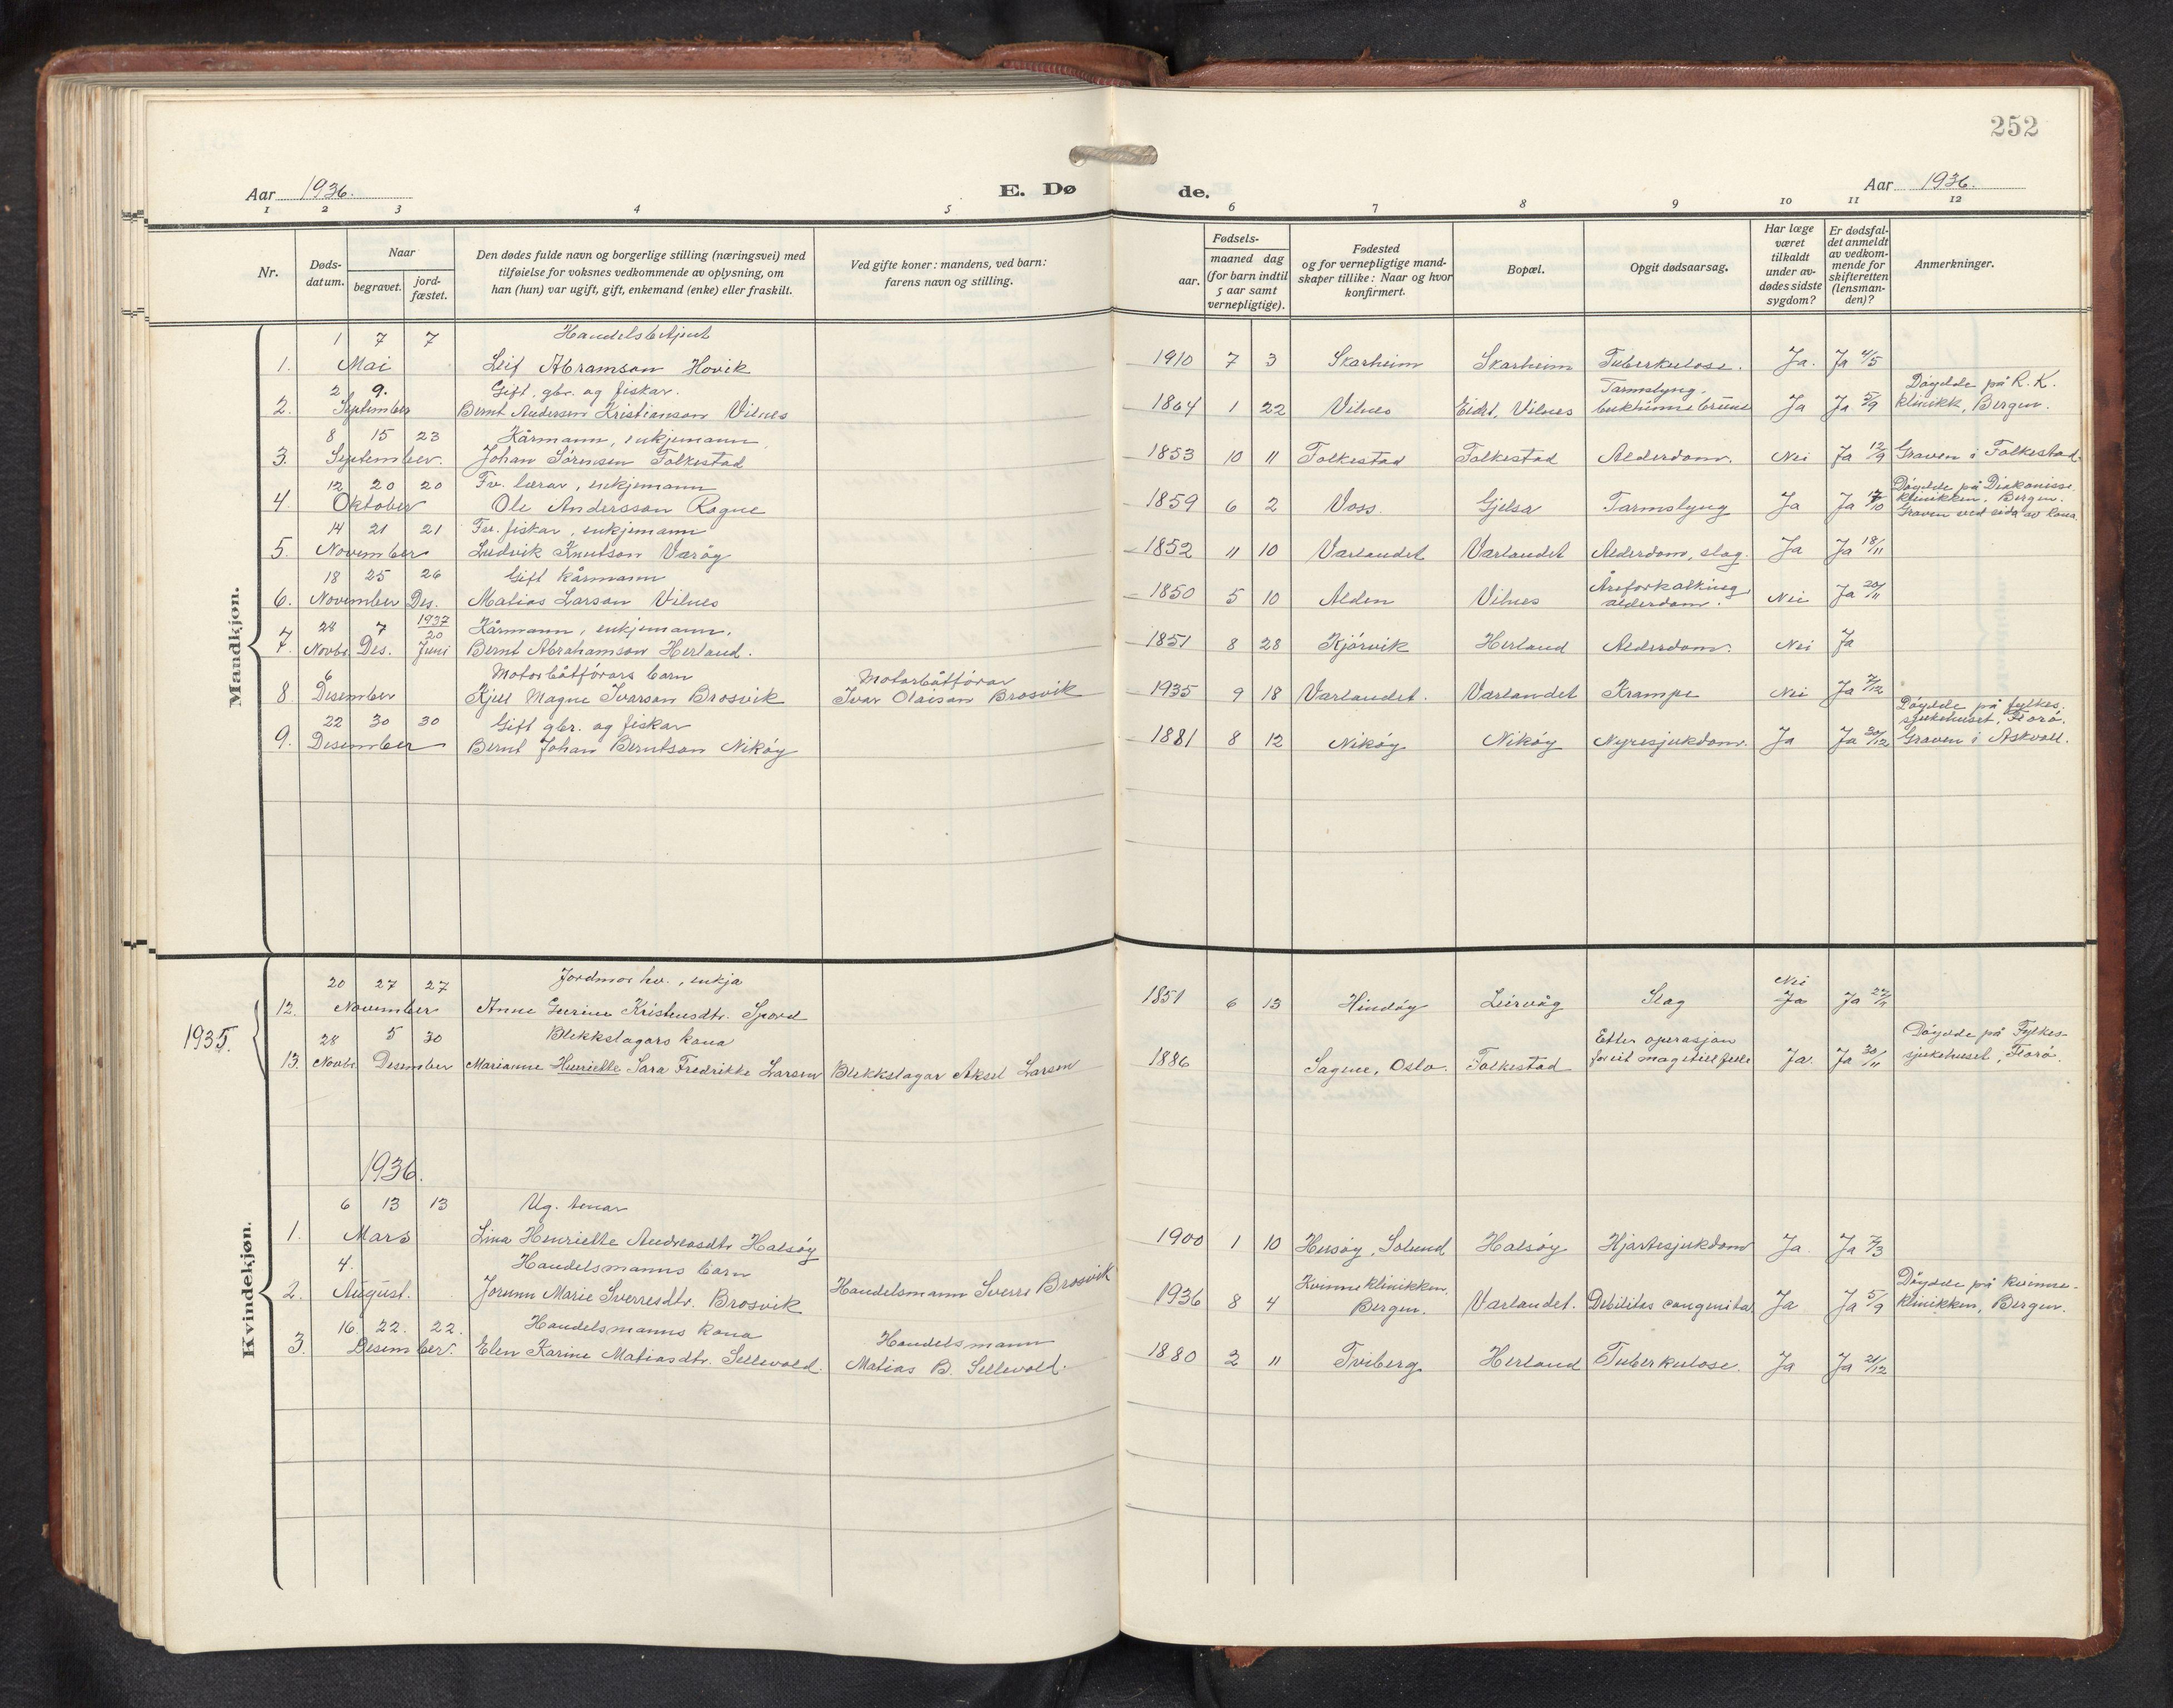 SAB, Askvoll sokneprestembete, H/Hab/Habb/L0002: Klokkerbok nr. B 2, 1910-1947, s. 251b-252a